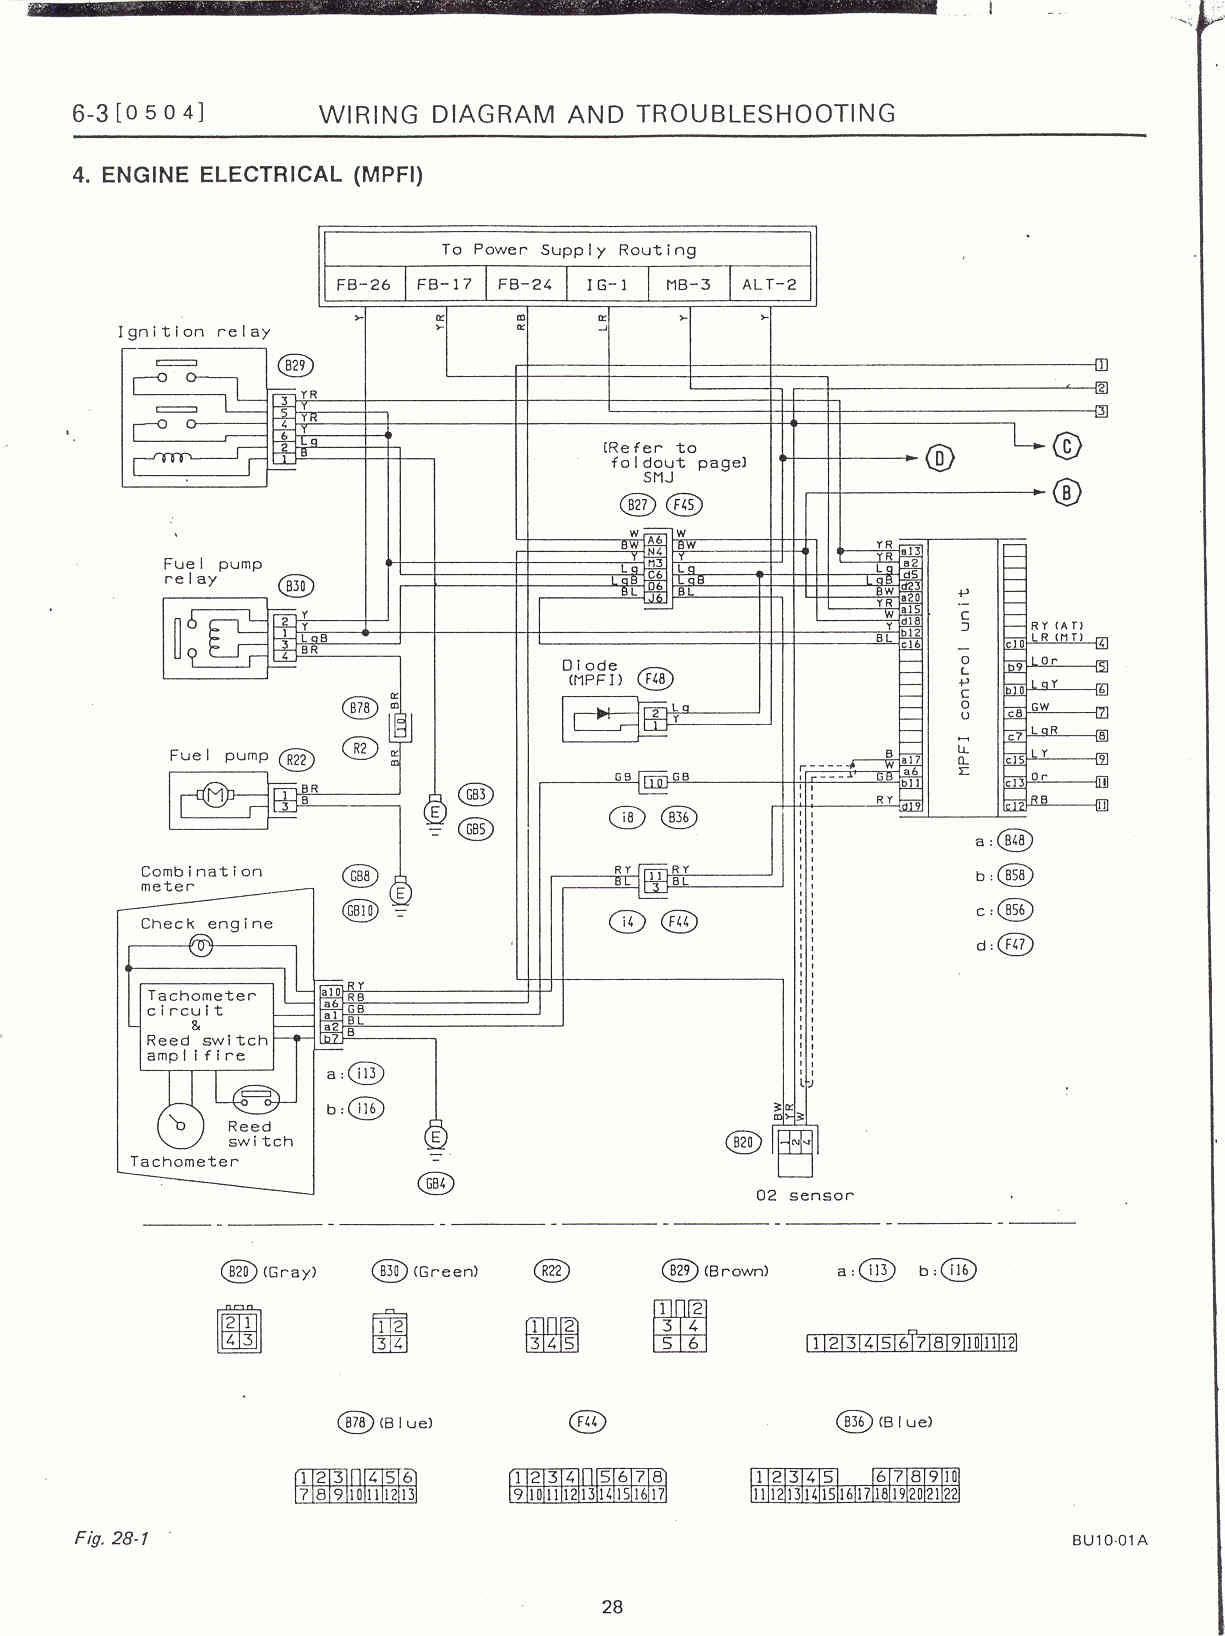 DIAGRAM] 2000 2 5rs Wiring Diagram FULL Version HD Quality Wiring Diagram -  MEDIAGRAME.FIMAANAPOLI.IT | Sport Comp Silver Tach 3911 Wiring Diagram |  | Diagram Database